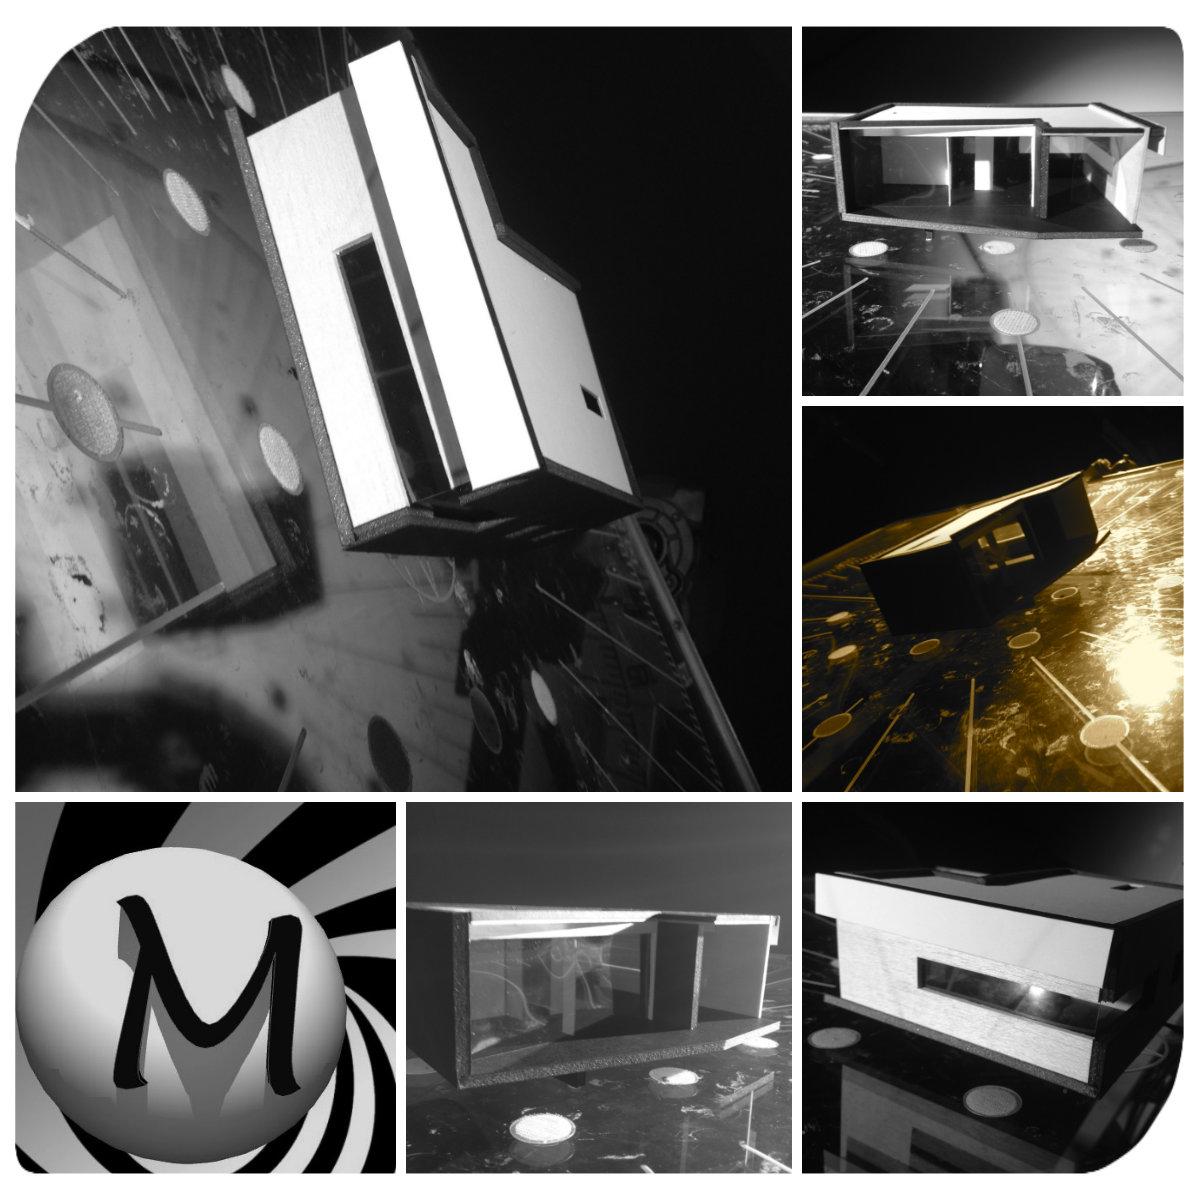 collage heliodon Testing - 3D Model.jpg